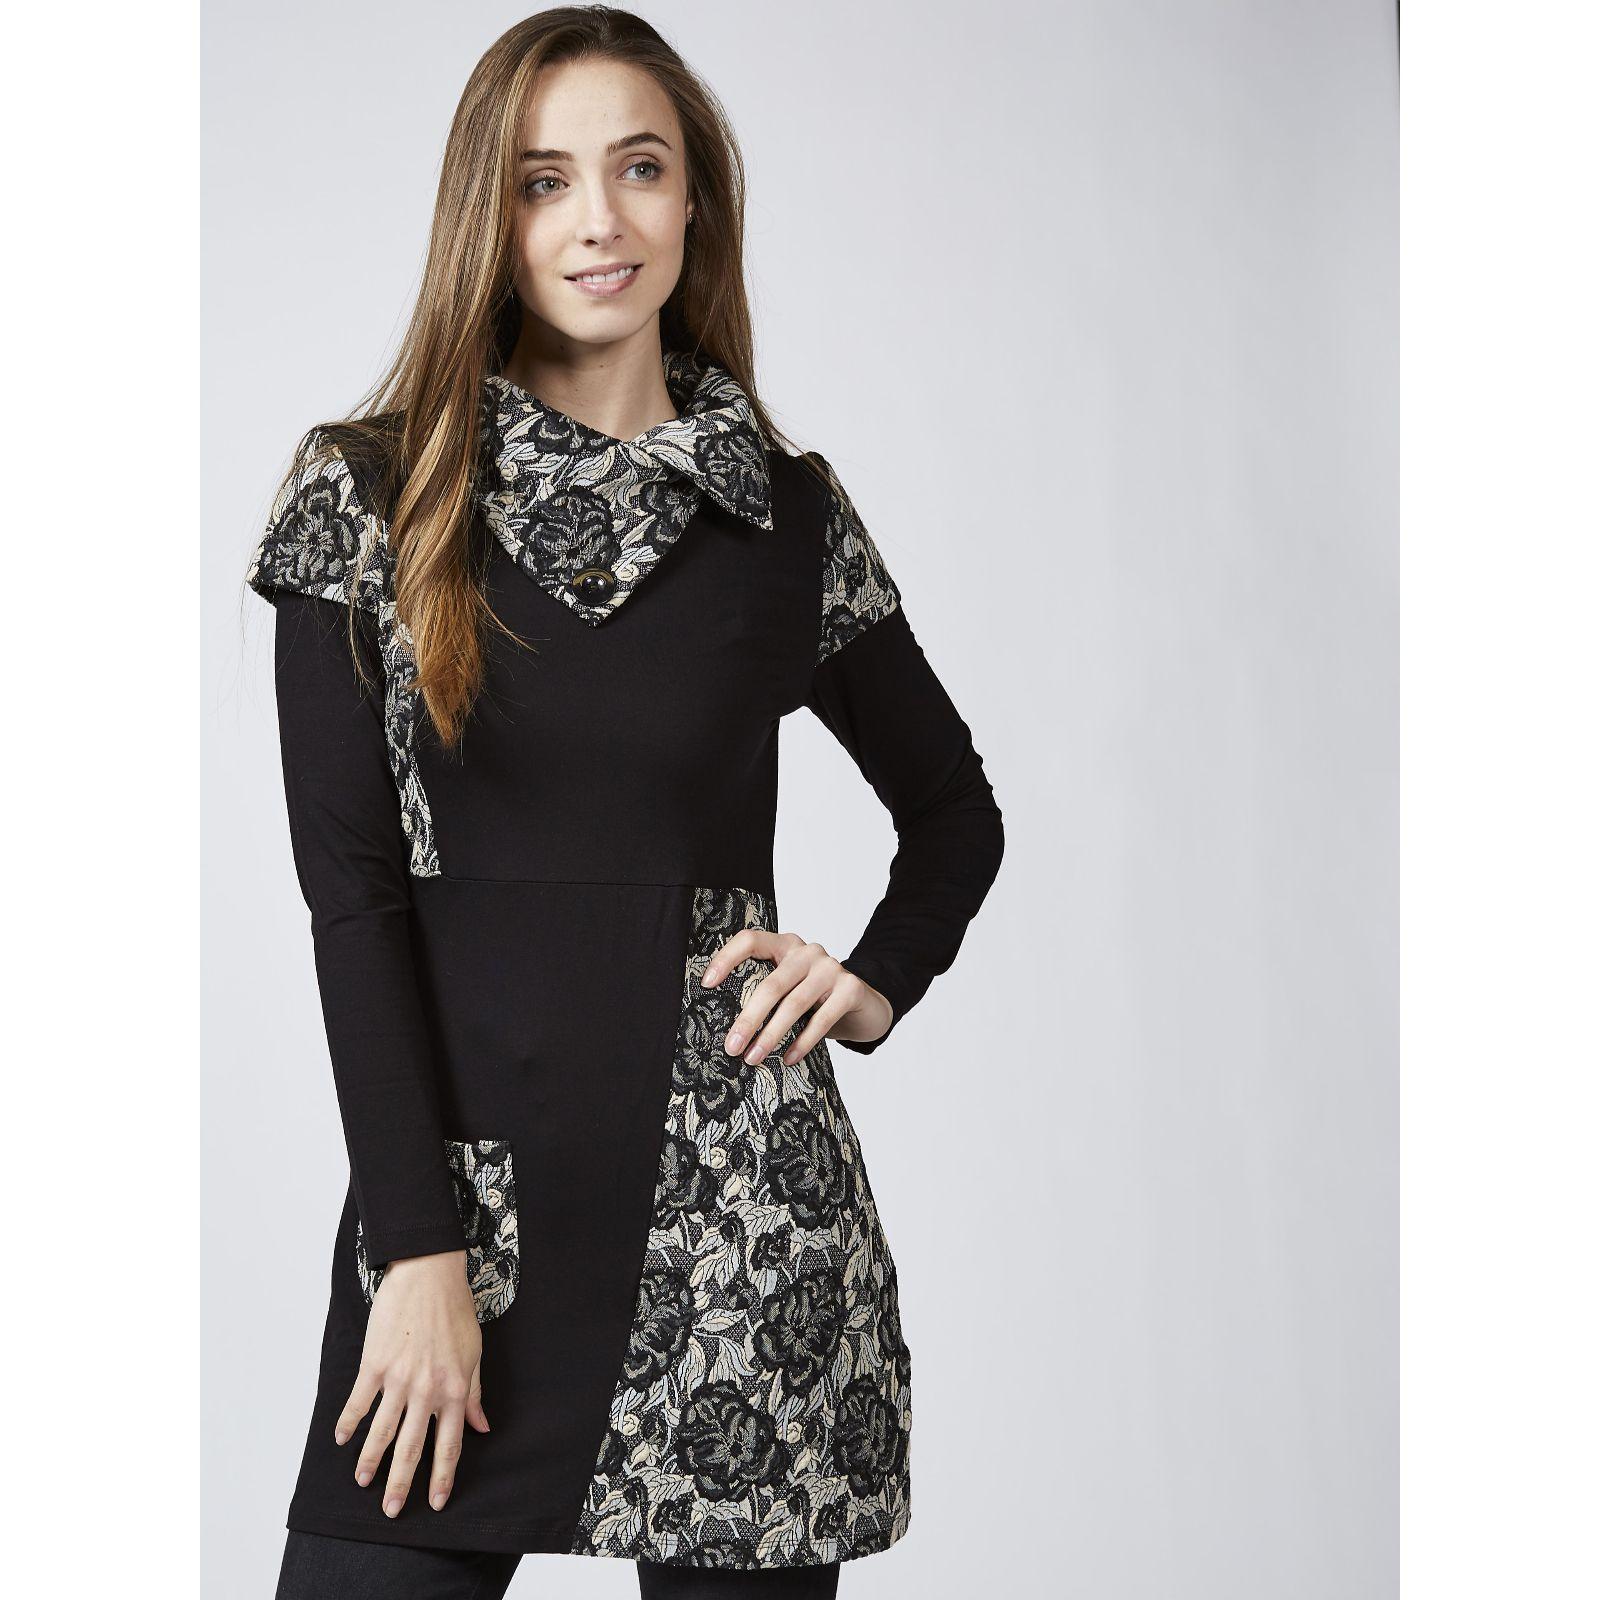 Black NEW JOE BROWNS Perfection Tunic Dress Size UK 16 Navy